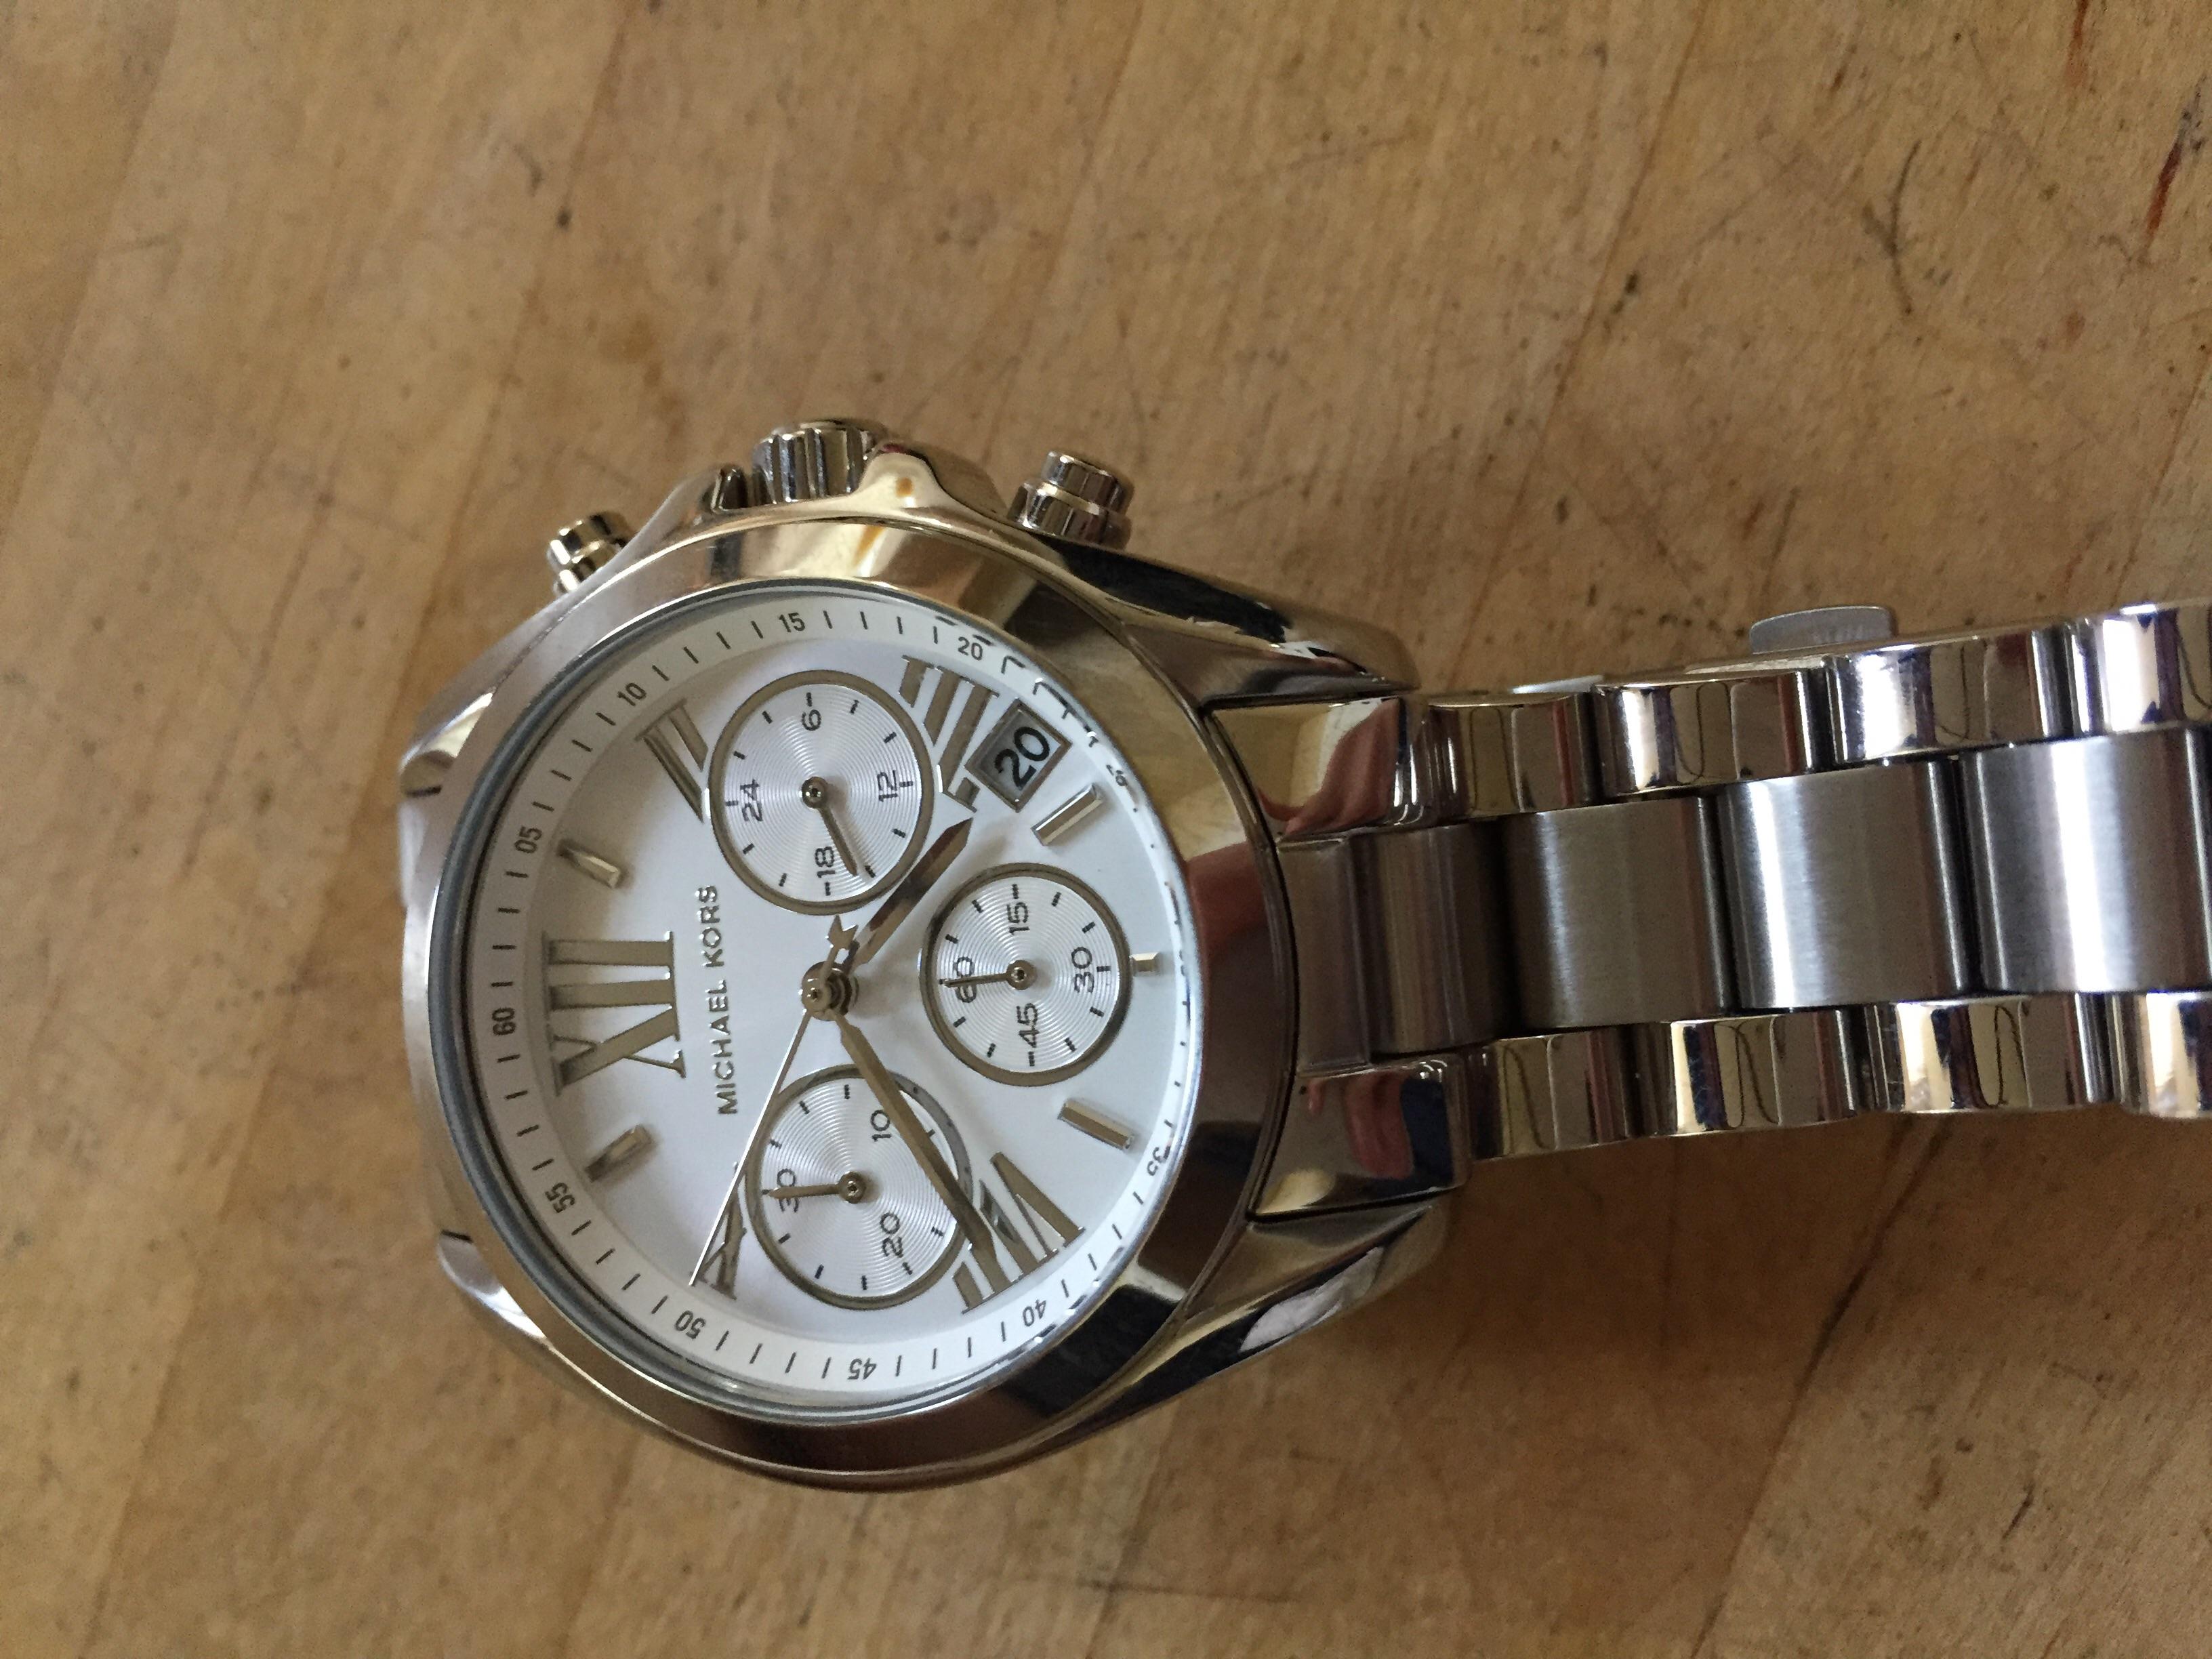 f02dce23ede7 Ladies Michael Kors Bradshaw Chronograph Watch (MK6174)